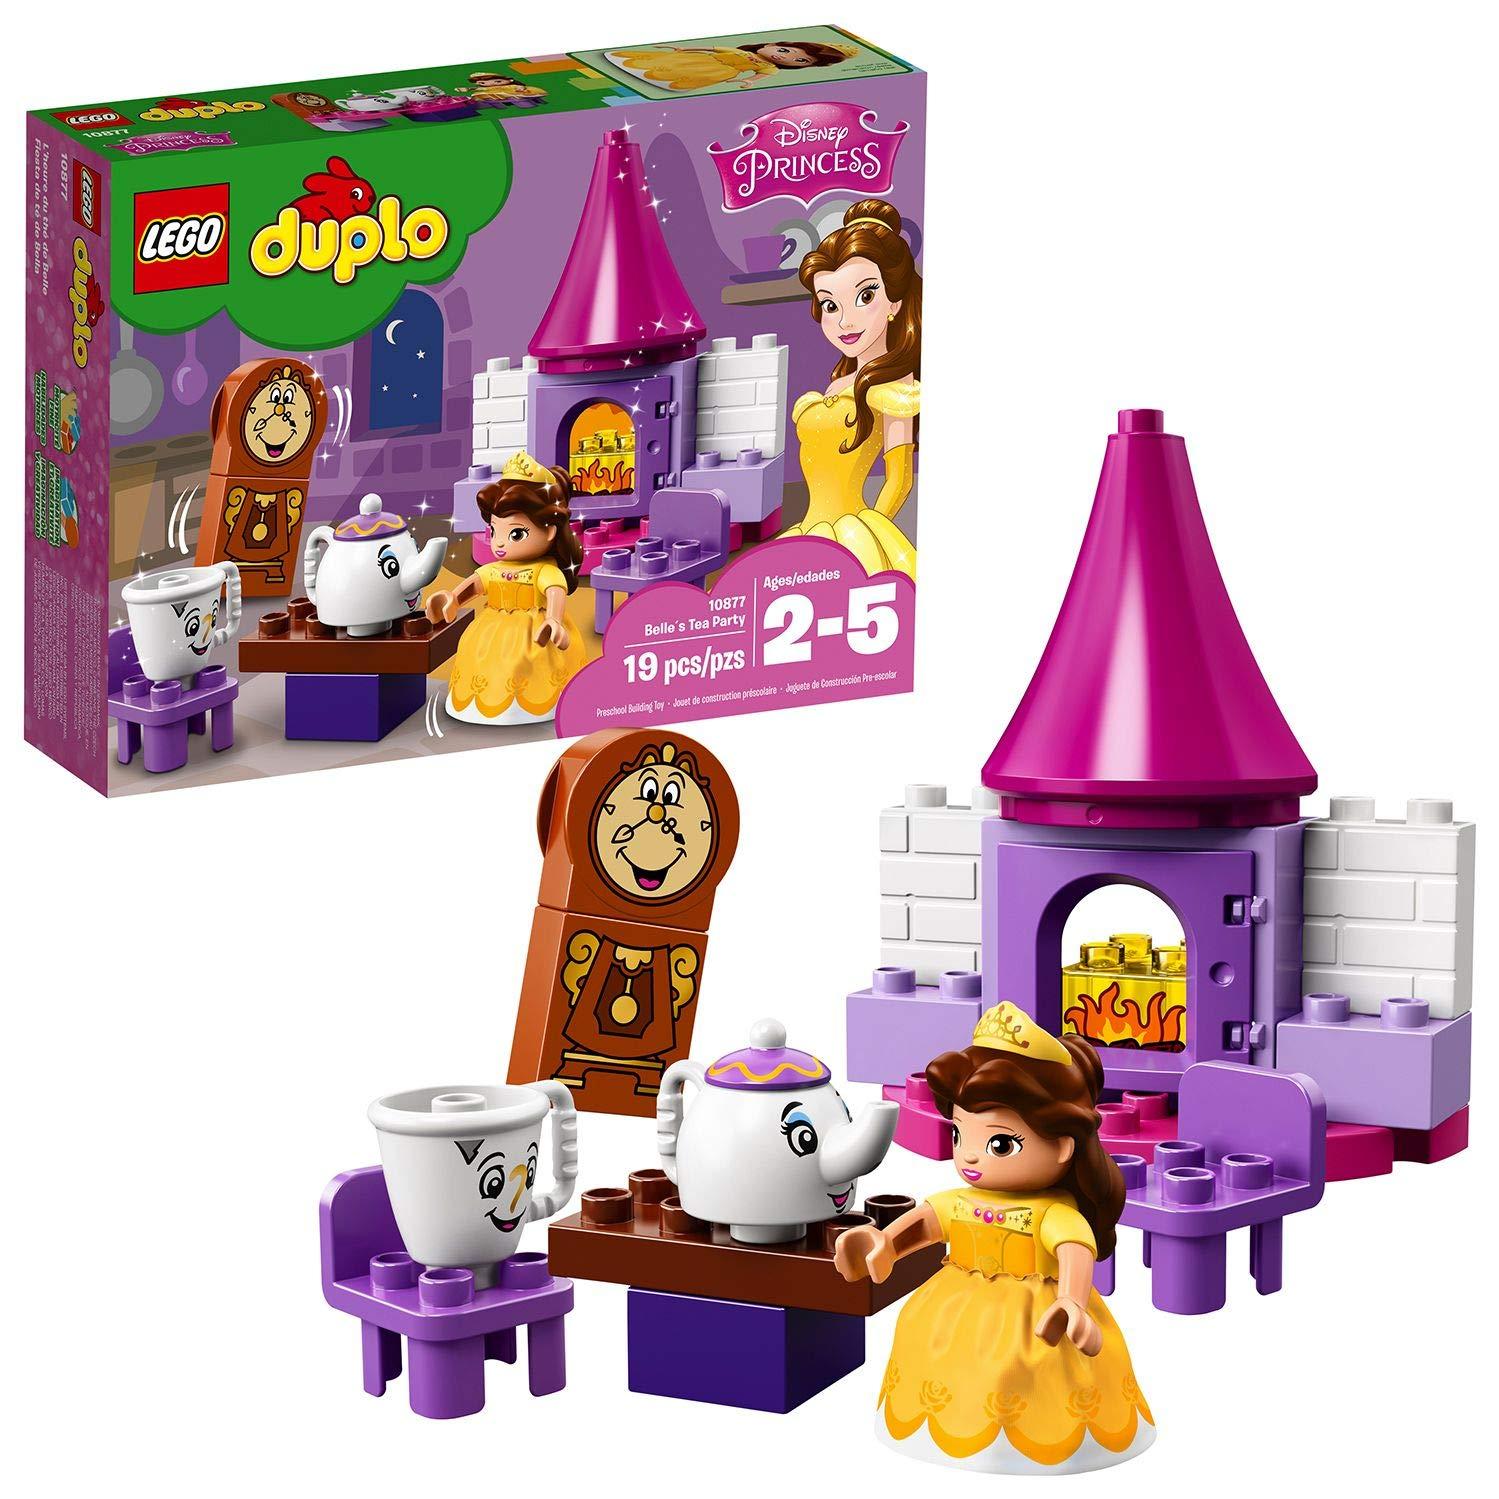 LEGO DUPLO Princesa - Fiesta de Té de Bella, Juguete de ...